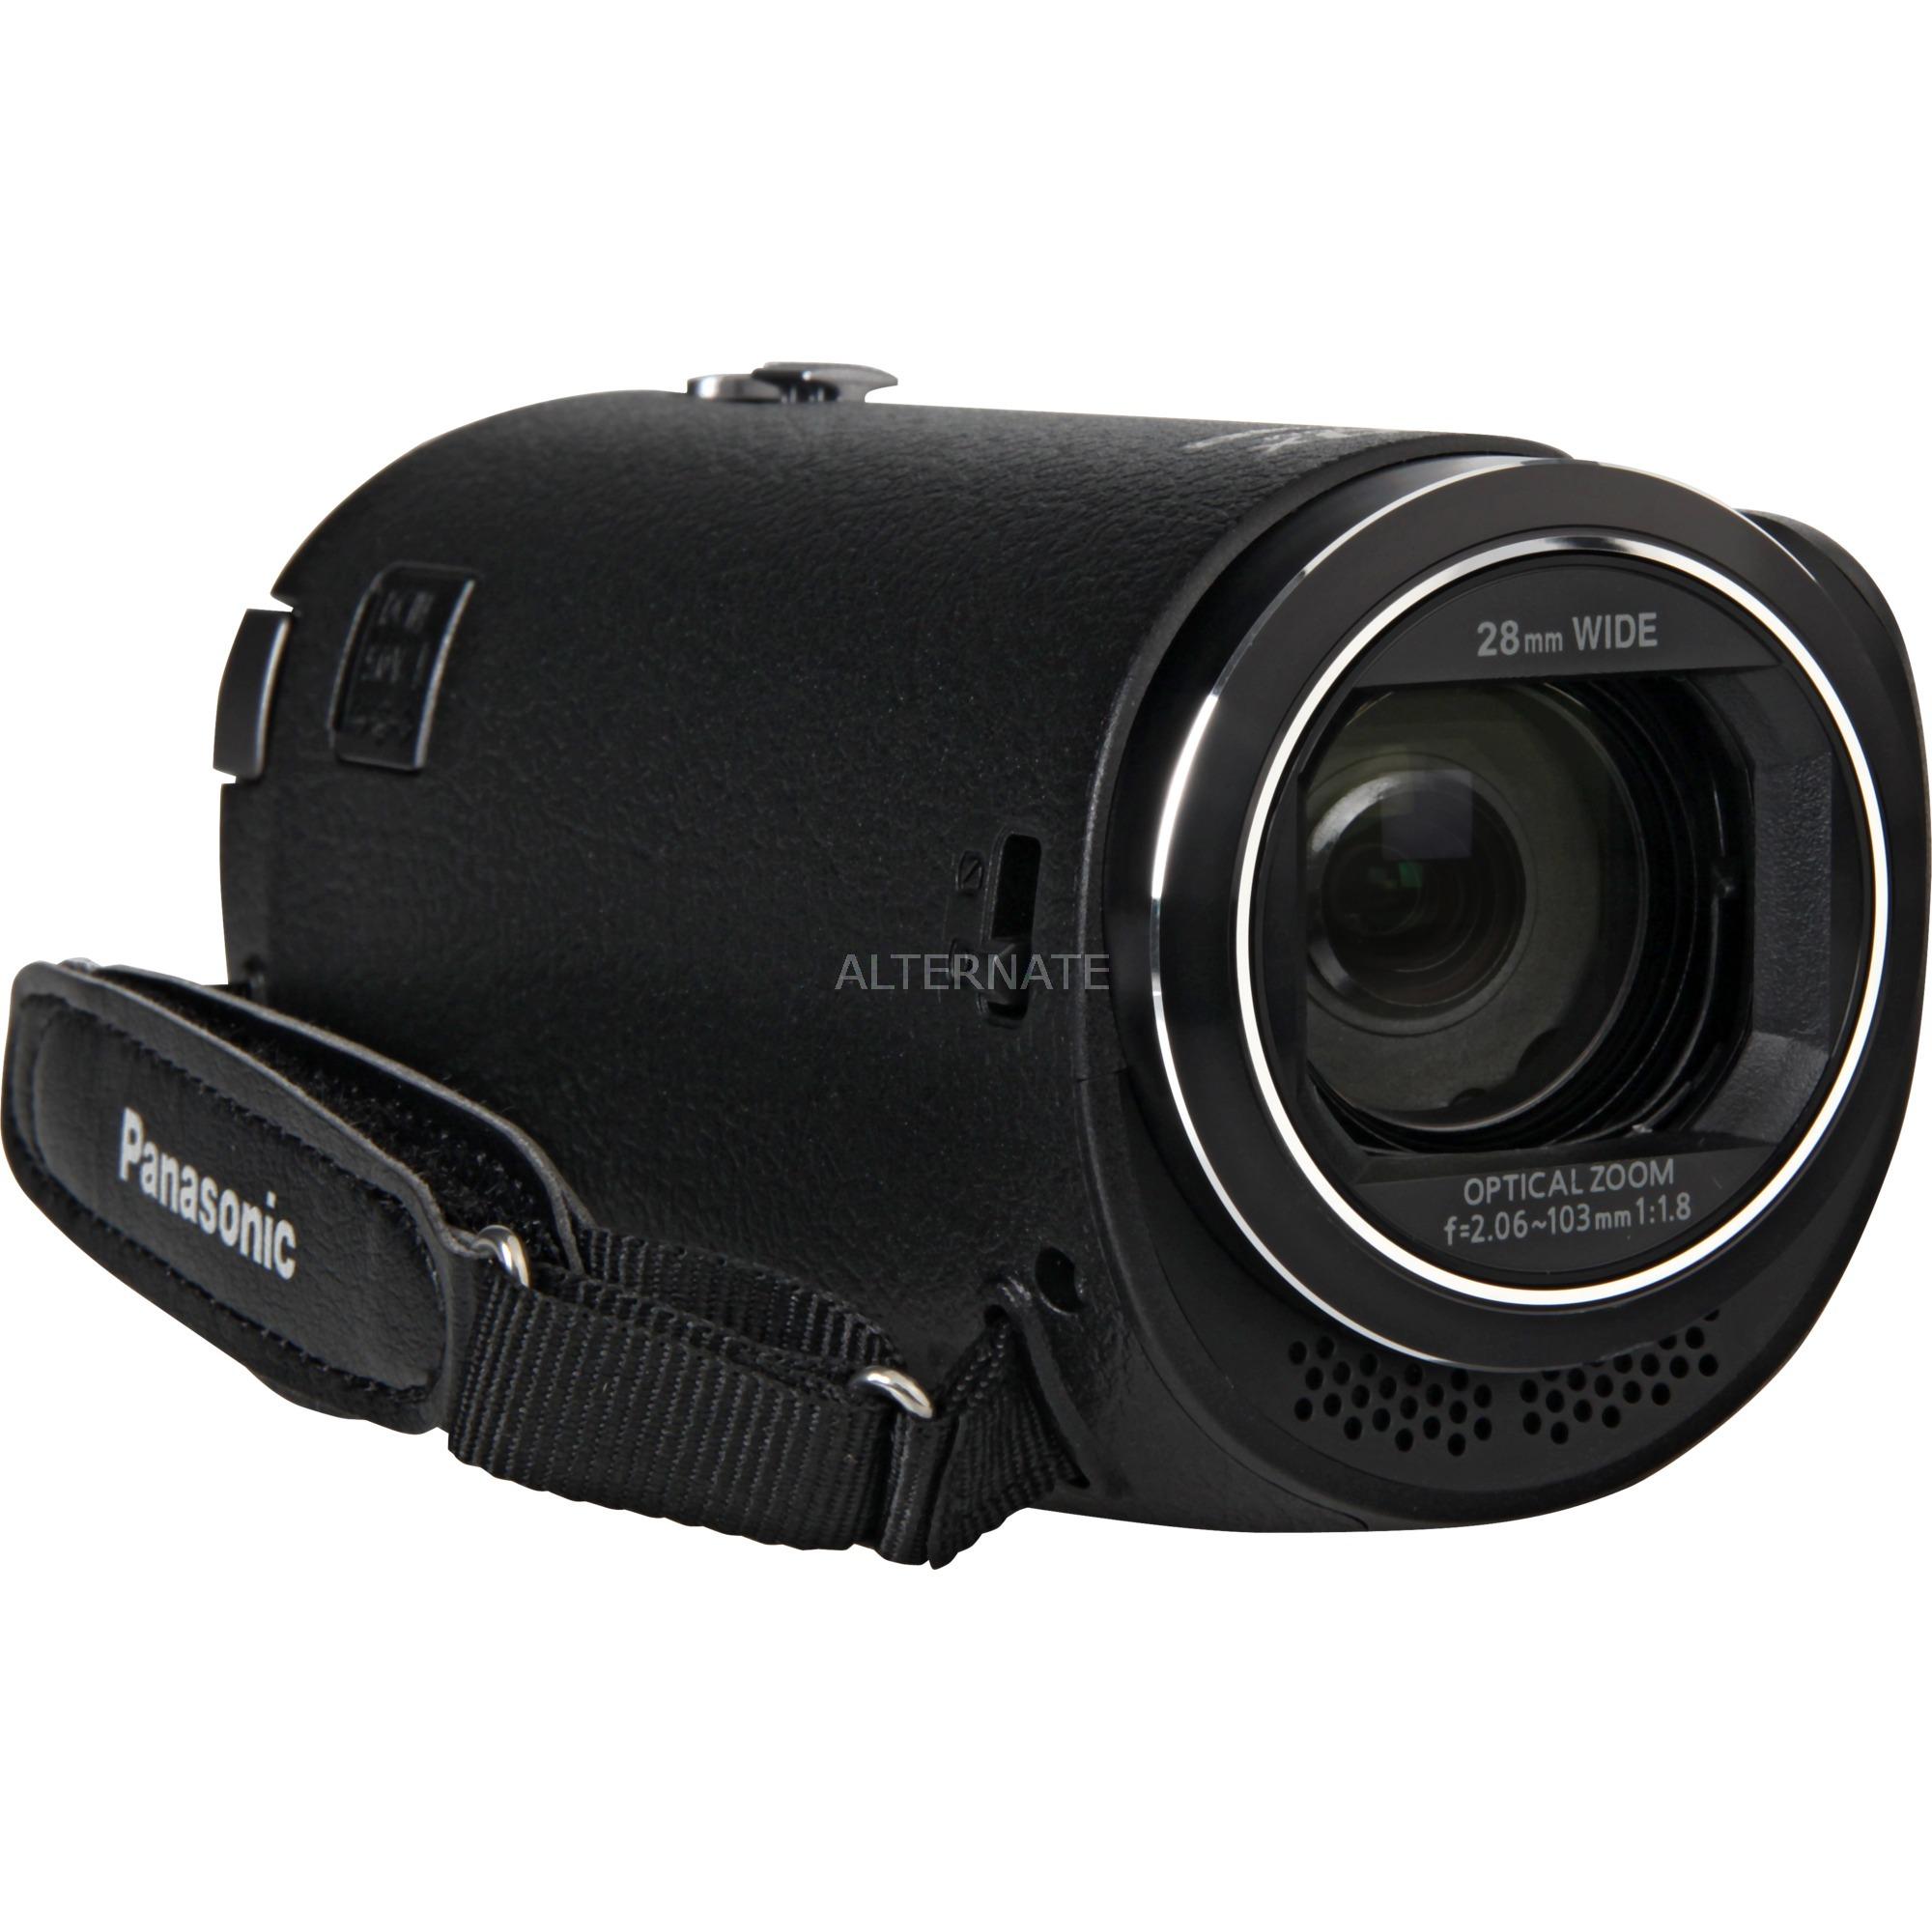 hc-v380eg-k-full-hd-haandholdt-videooptager-videokamera